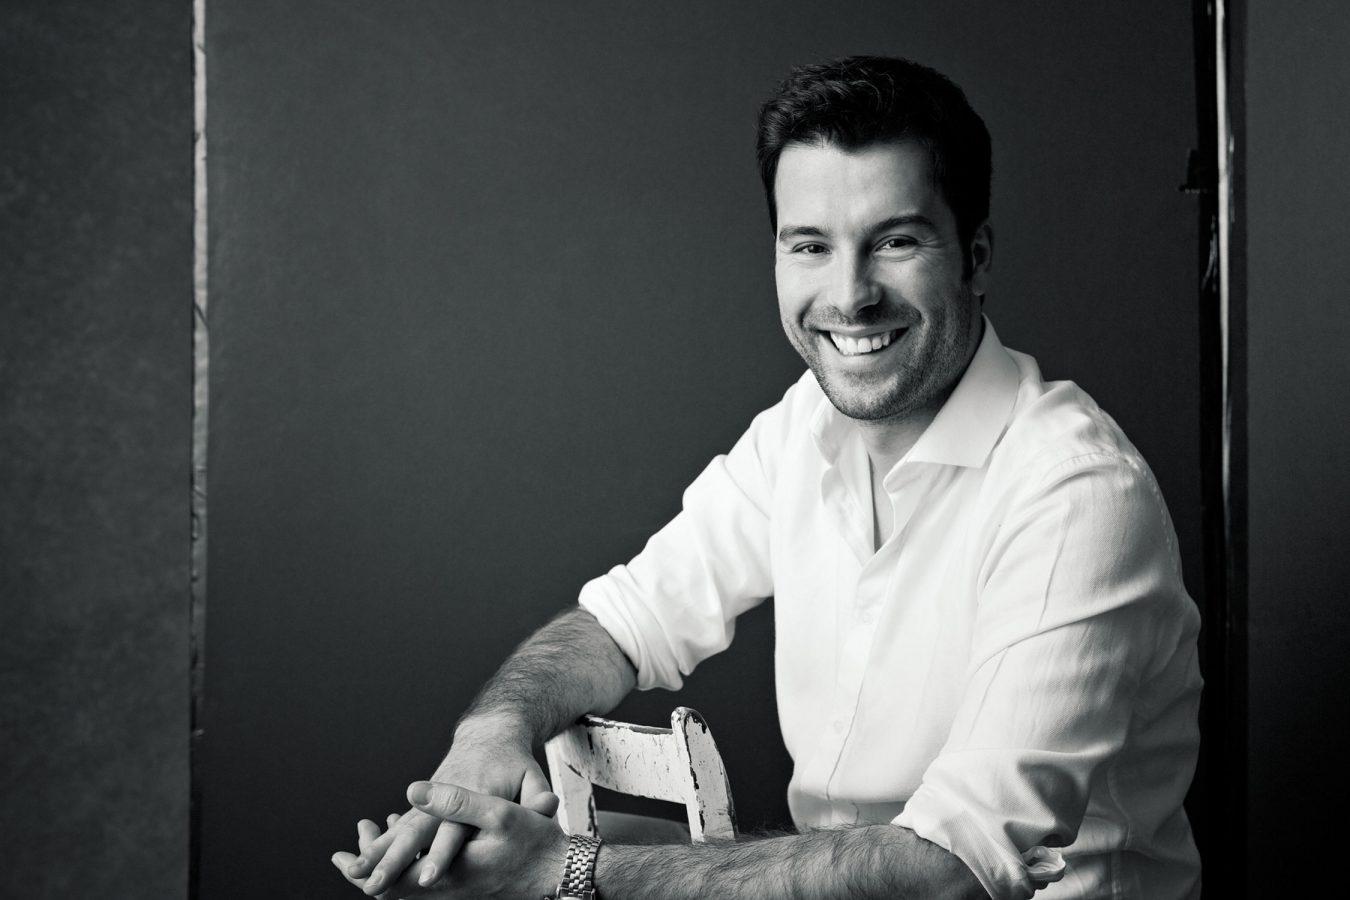 modern-black-and-white-businessman-portrait